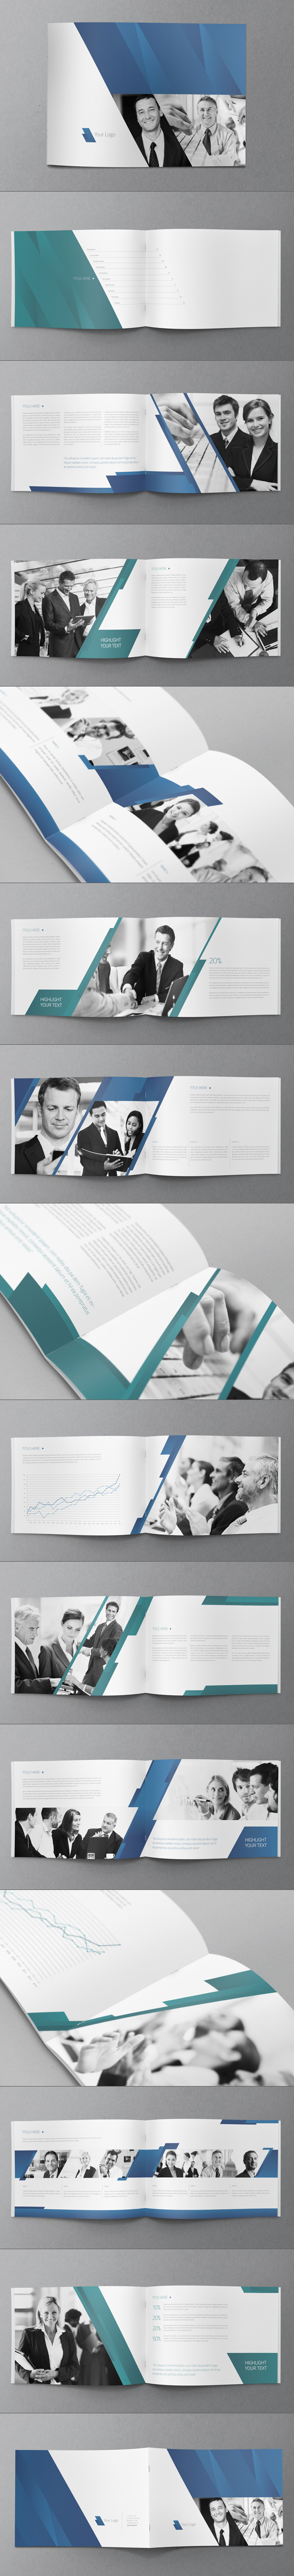 Business Brochure Design by Abra Design